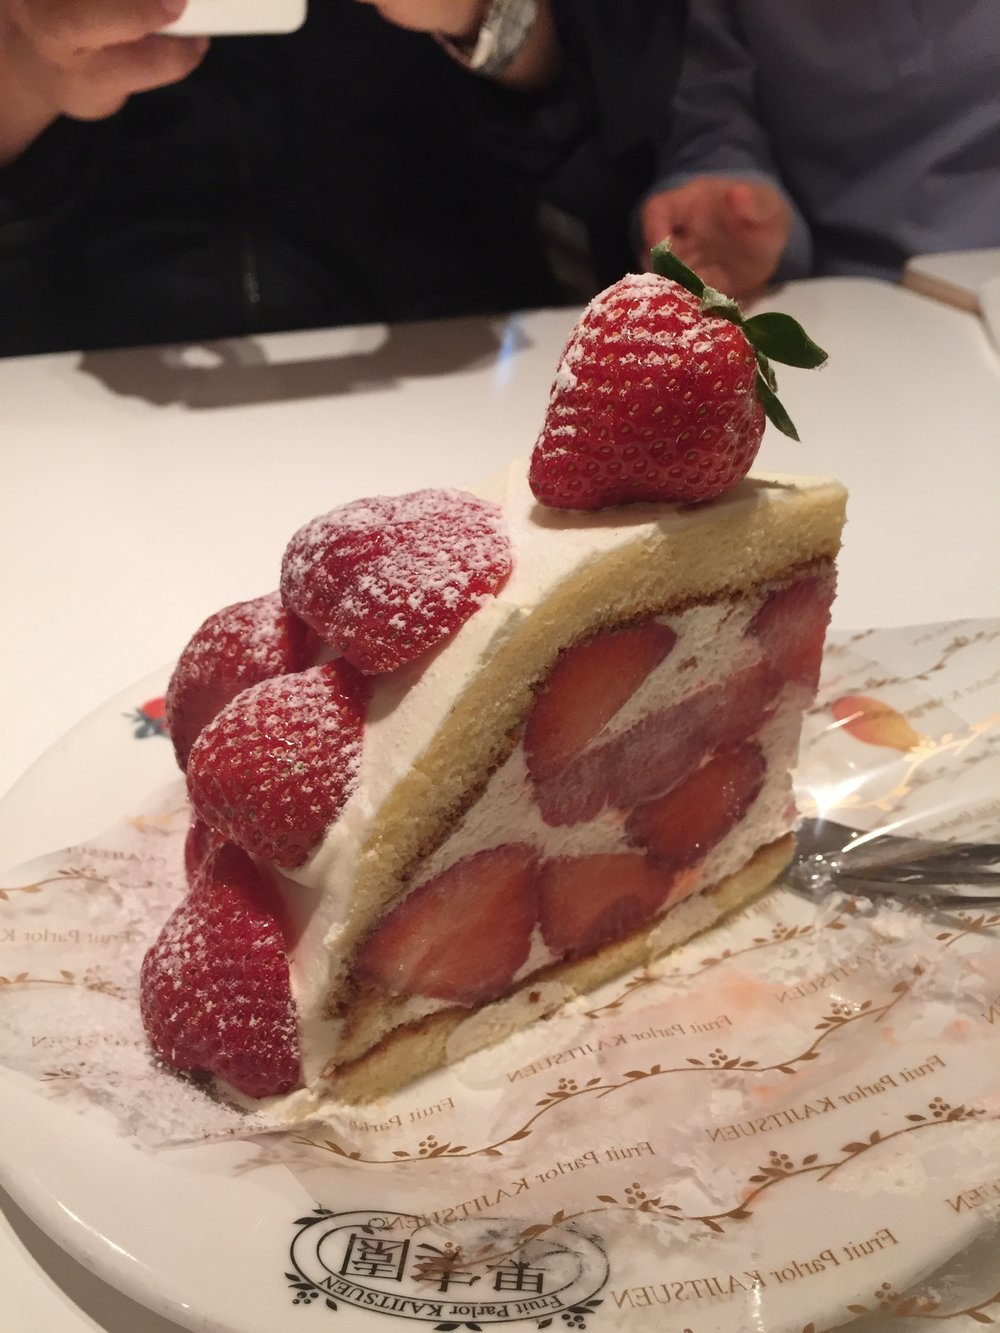 Strawberry & cream cake